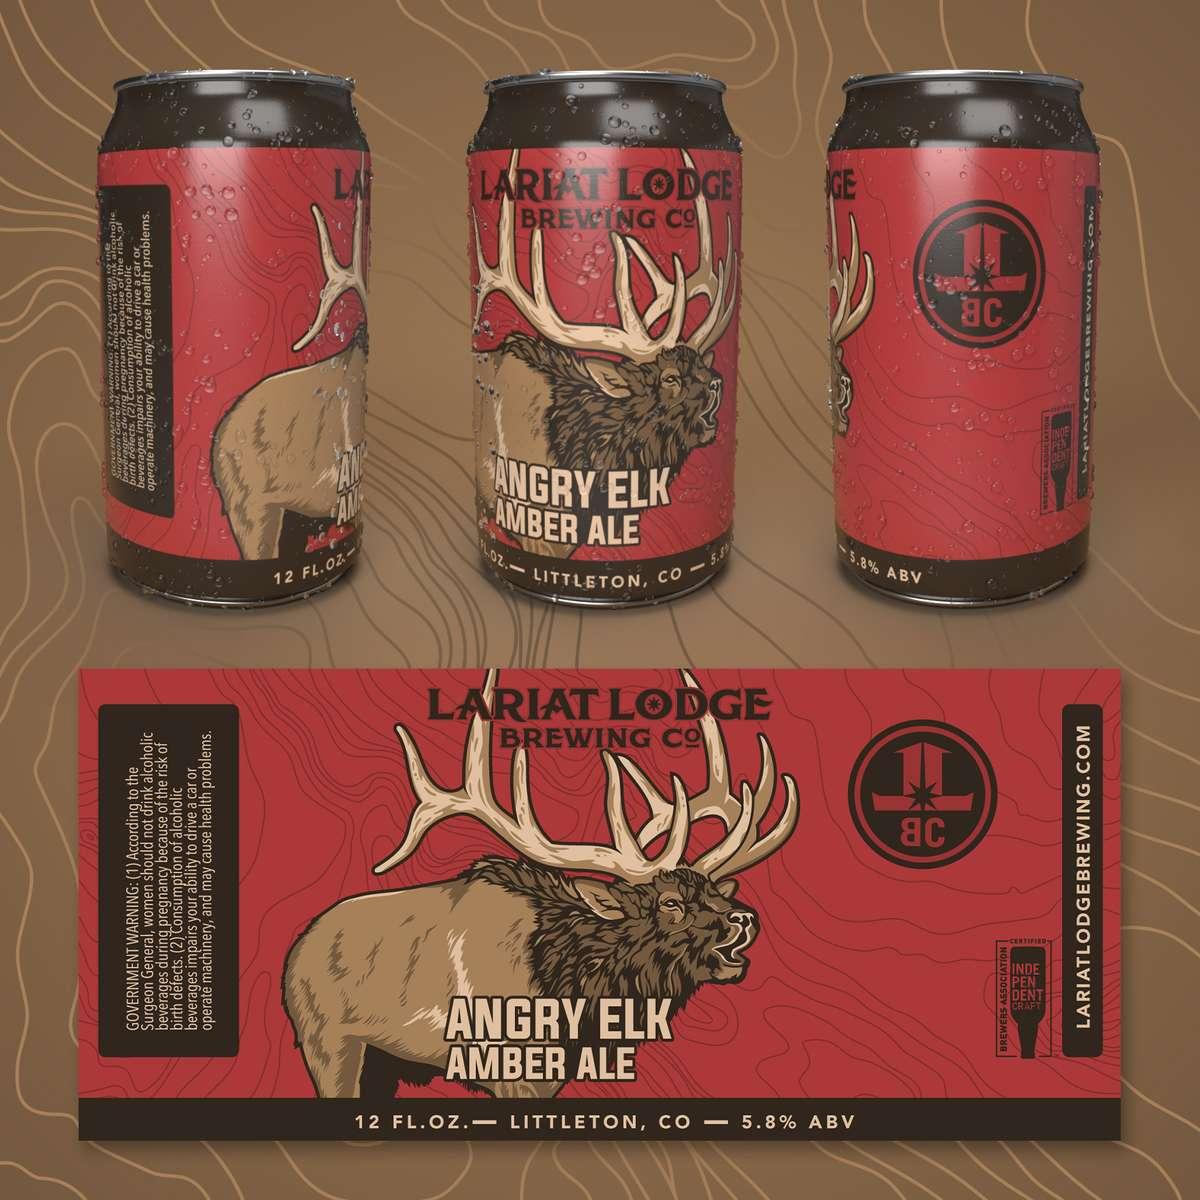 Angry Elk Amber Ale